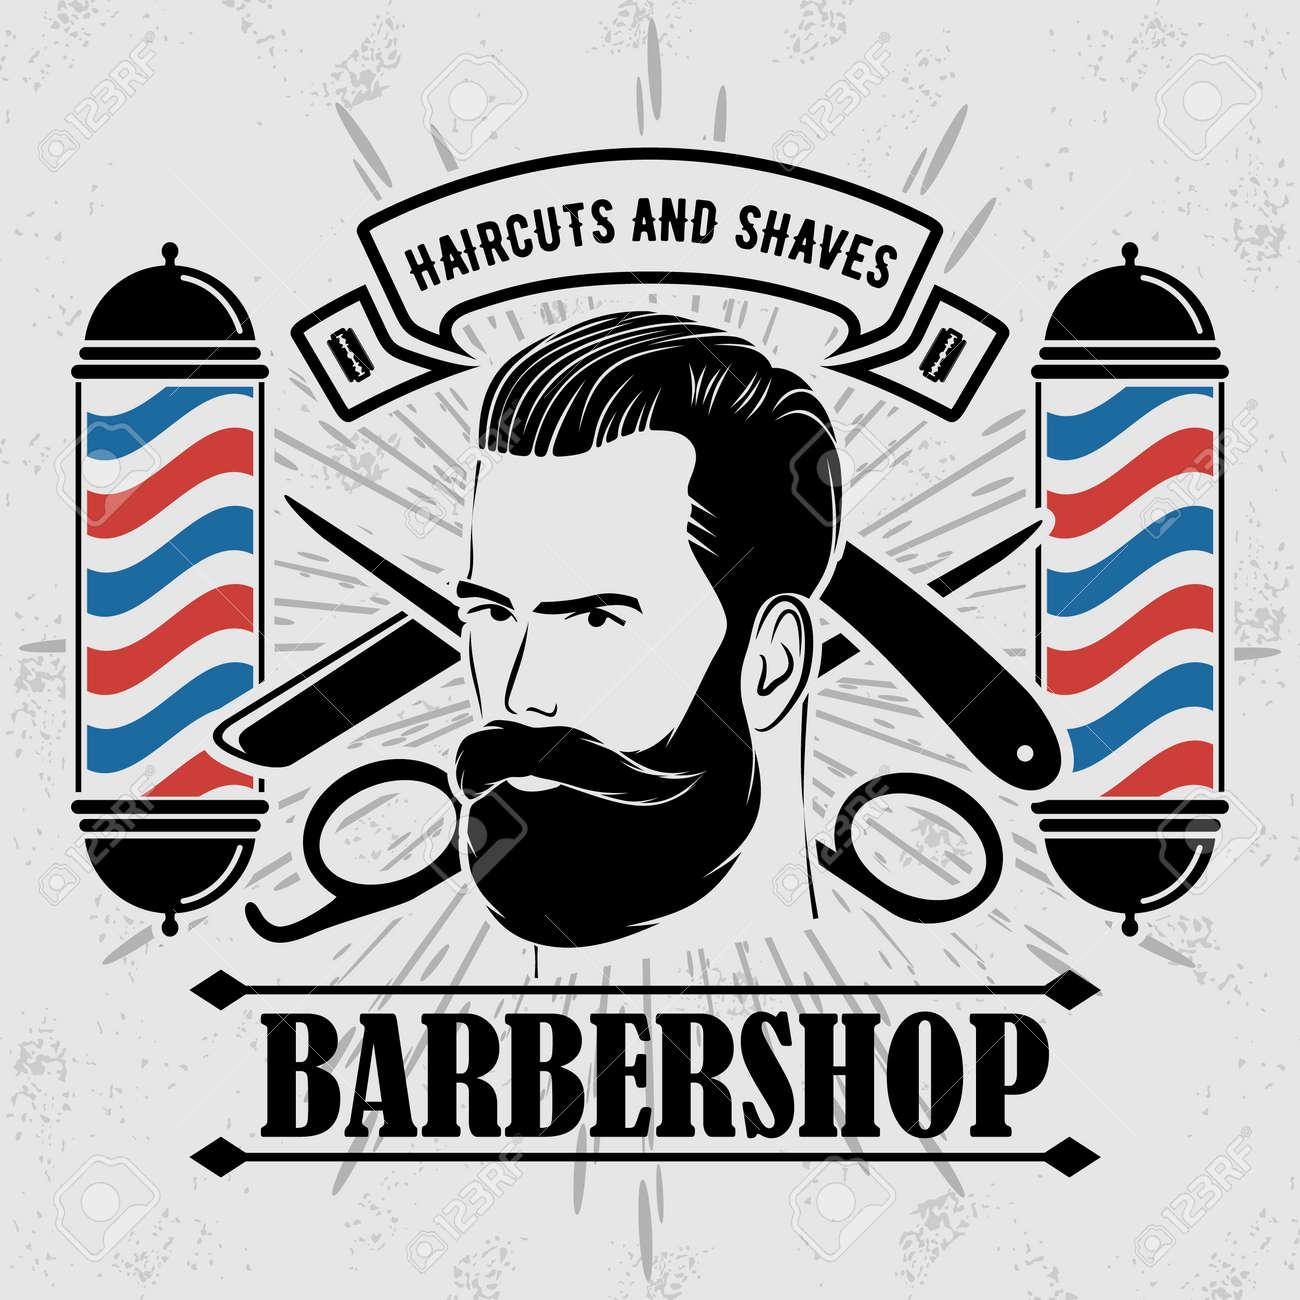 Barbershop design concept with barber pole - 169447745